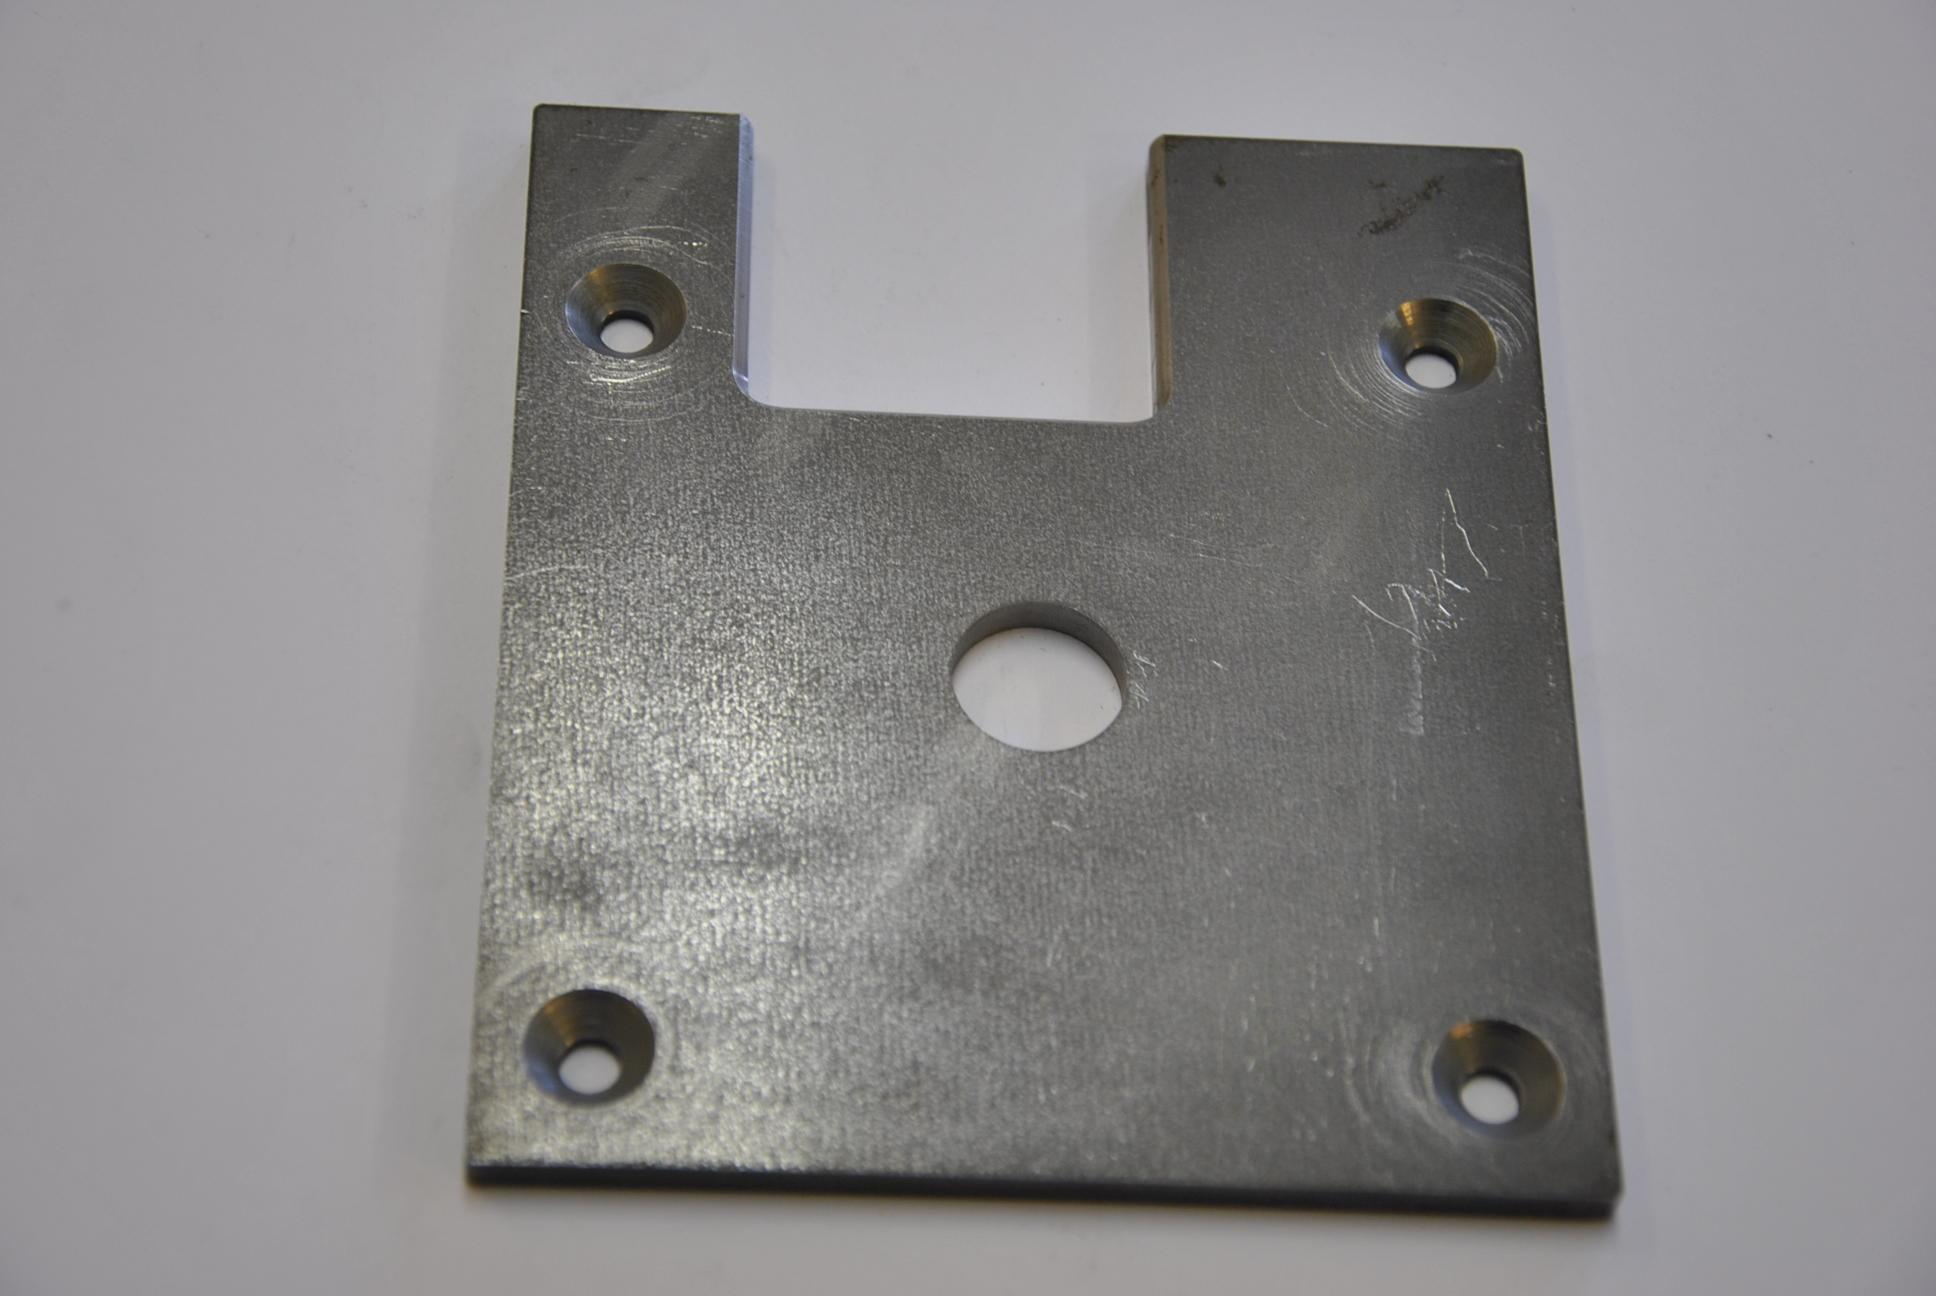 Пластина скручивающего устройства, нижняя, 5 шт./комп.